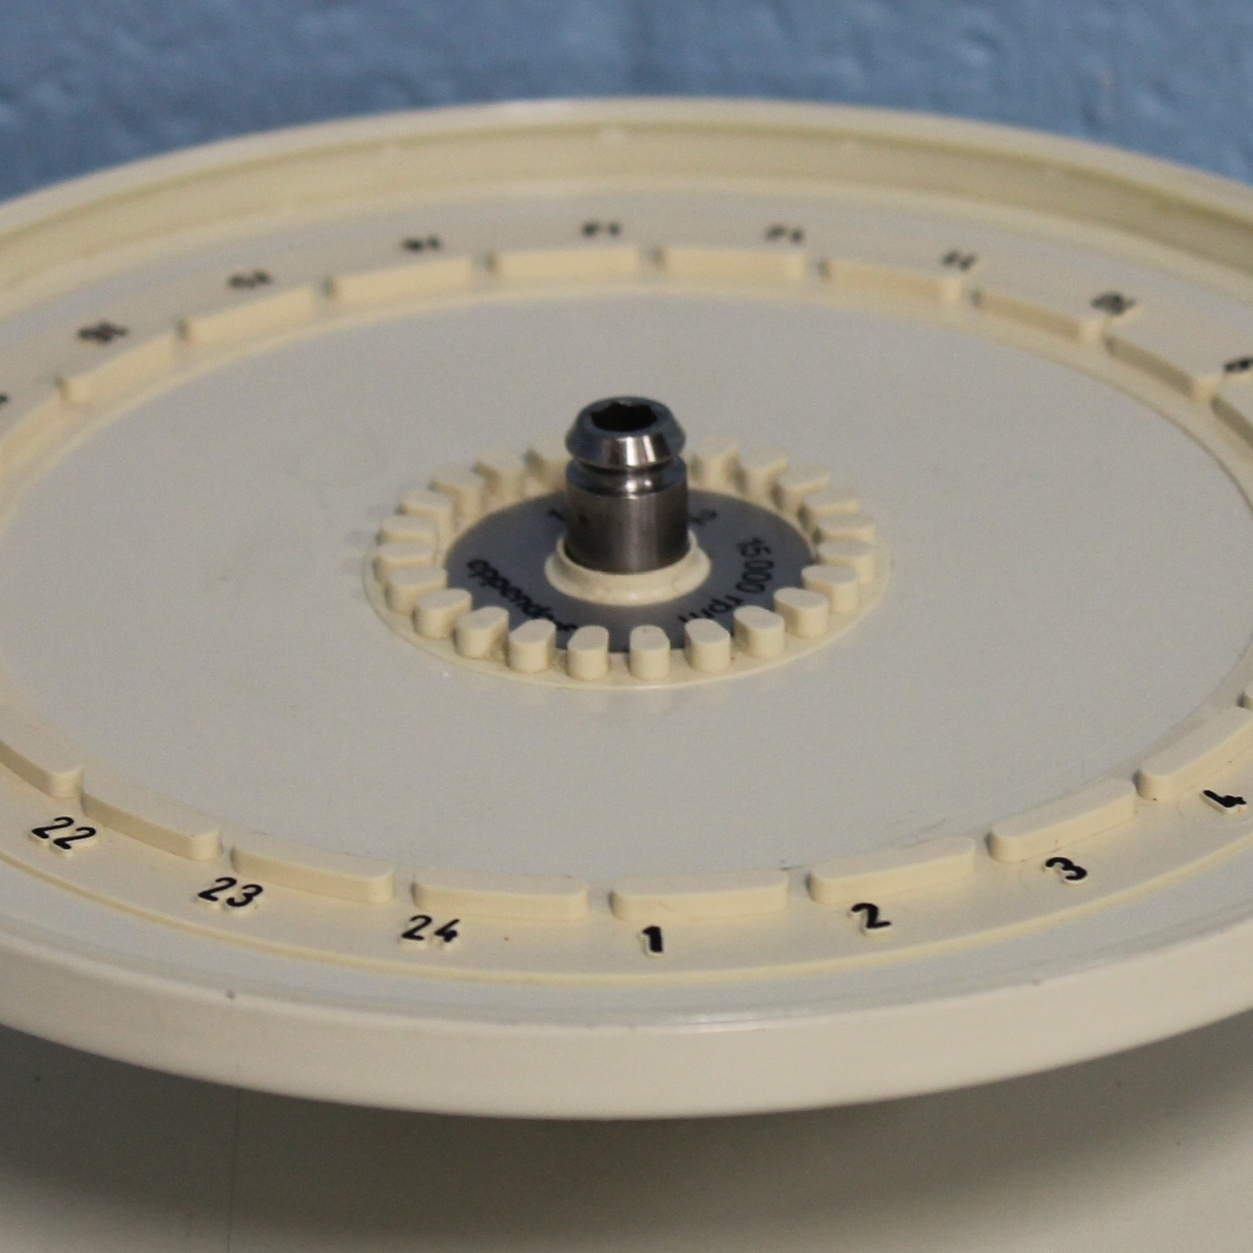 Eppendorf Hematocrit Rotor Type 16H24-2 Image